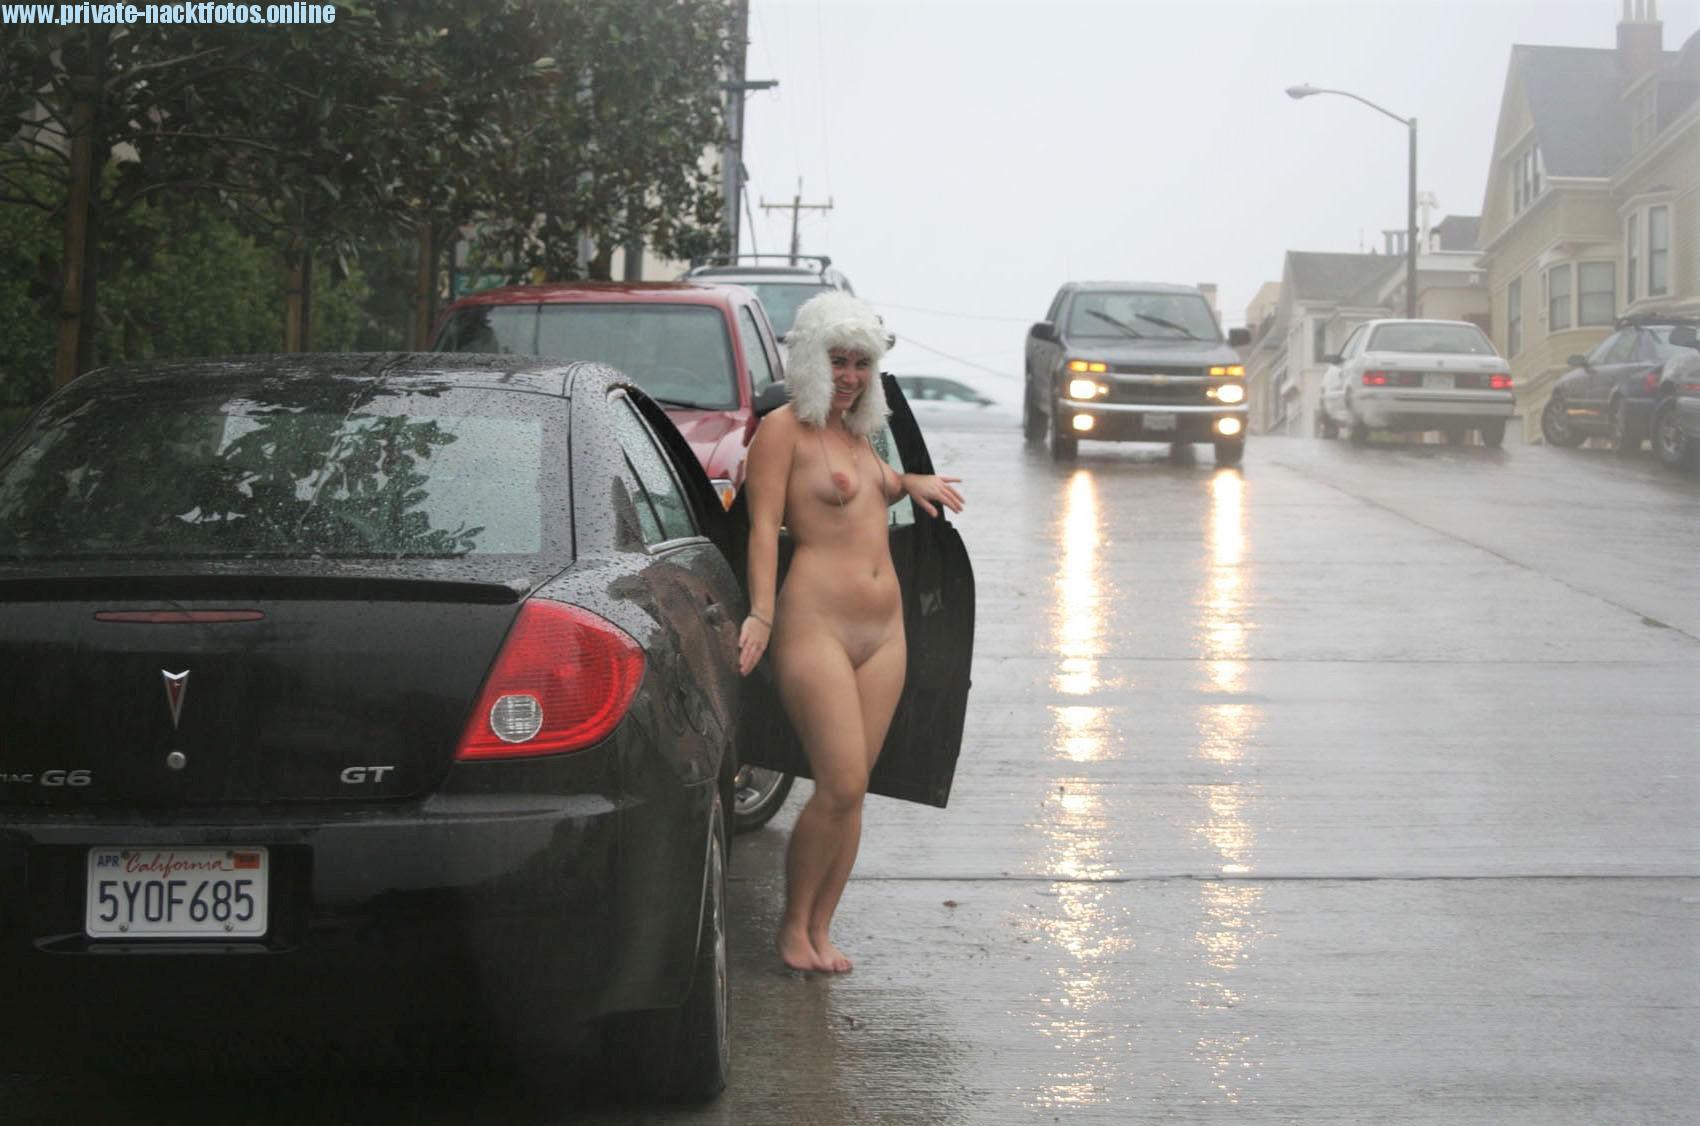 Nude In Public Amateur Bild Foto Draussen Exhib Voyeur